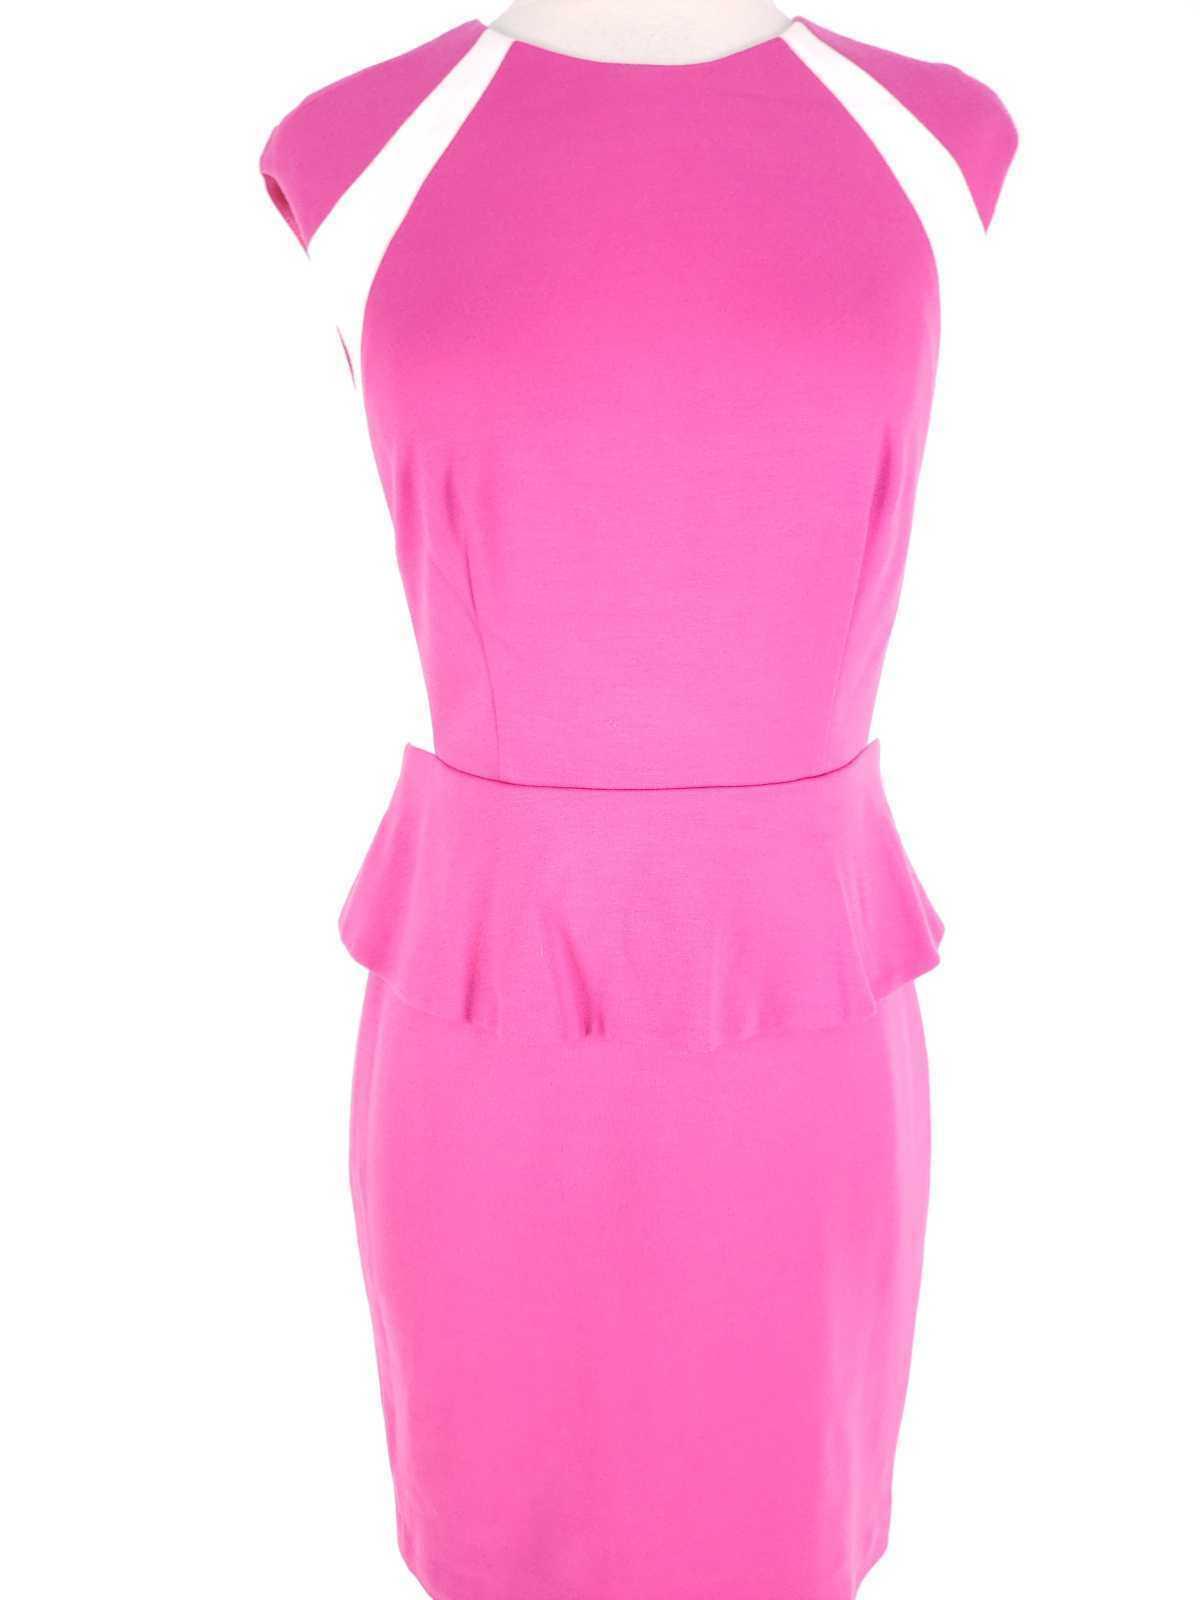 Cynthia Steffe Women Dress Size 2 NWT $198 Peplum Pencil Ponte Knit Sleeveless image 2